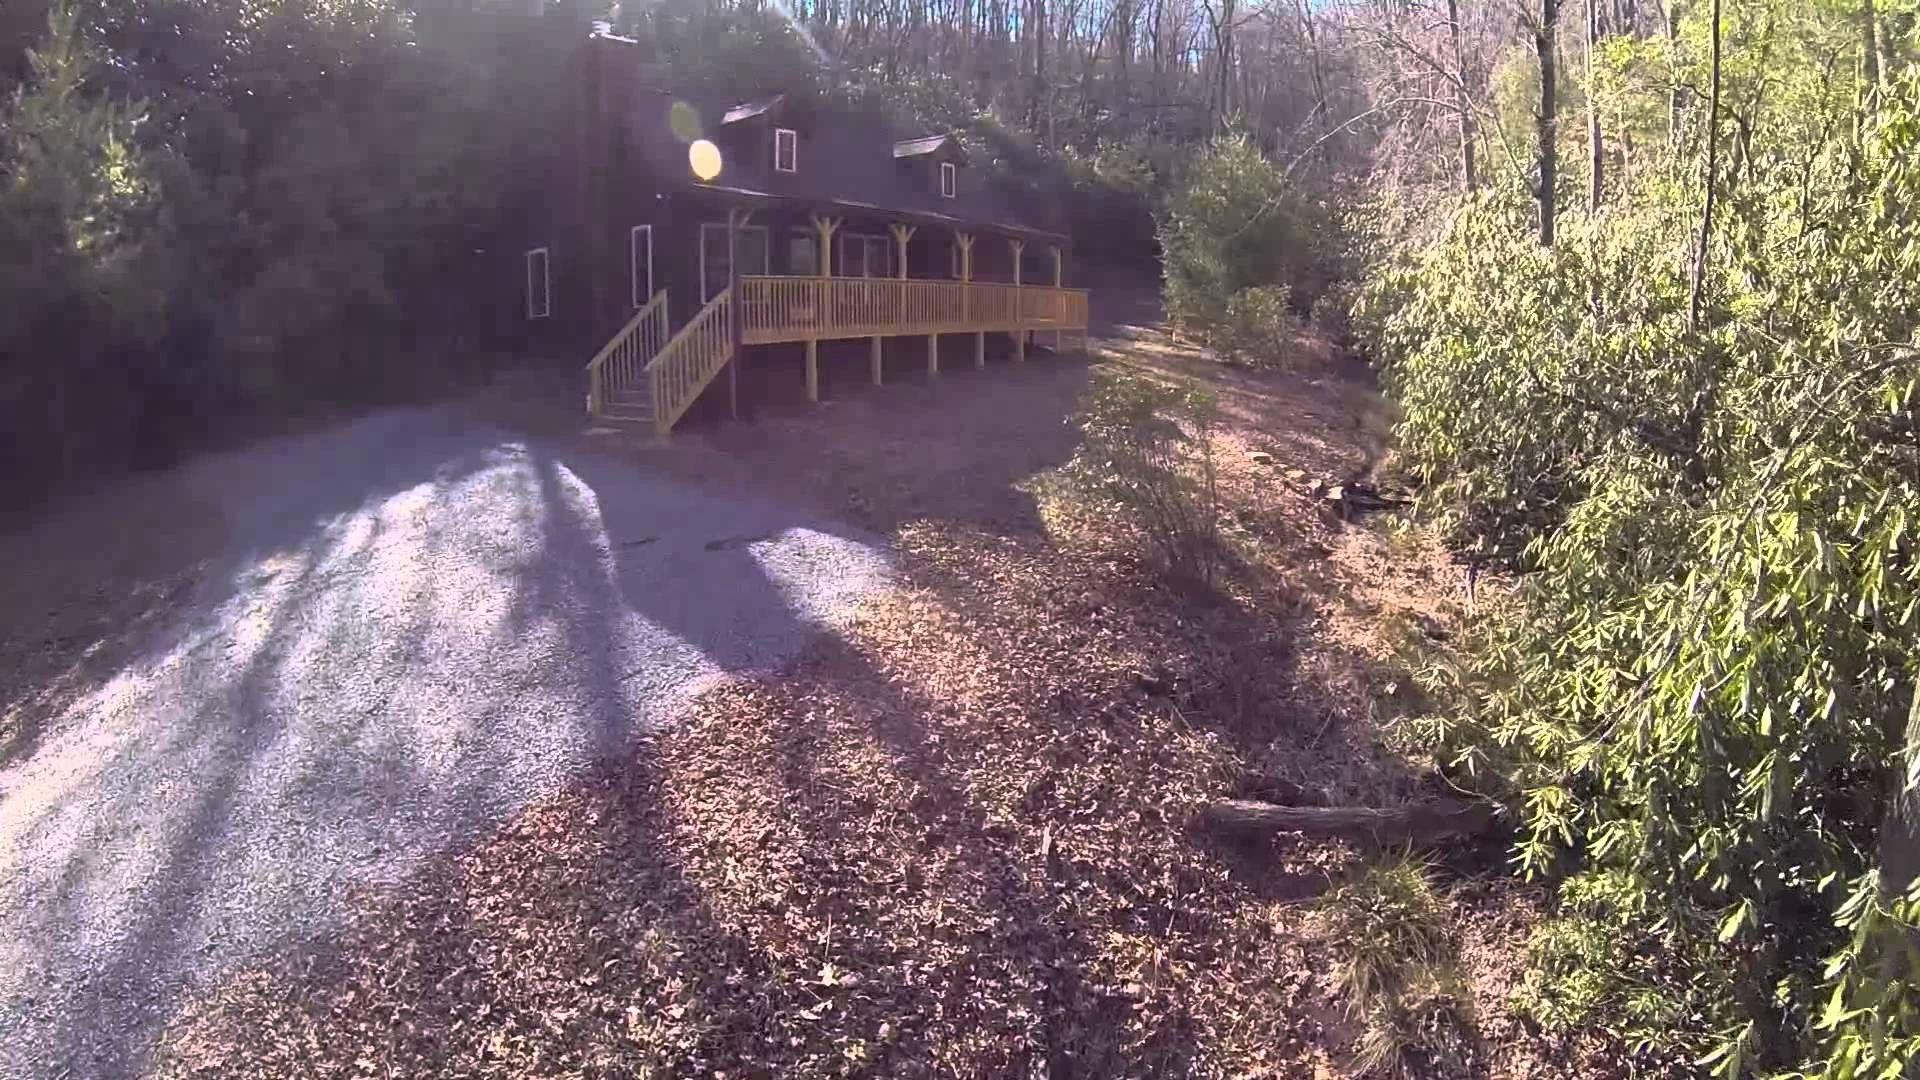 rental brevard cabin state asheville mountains nc cabins ridge cheap parks in blue rentals pet north friendly carolina